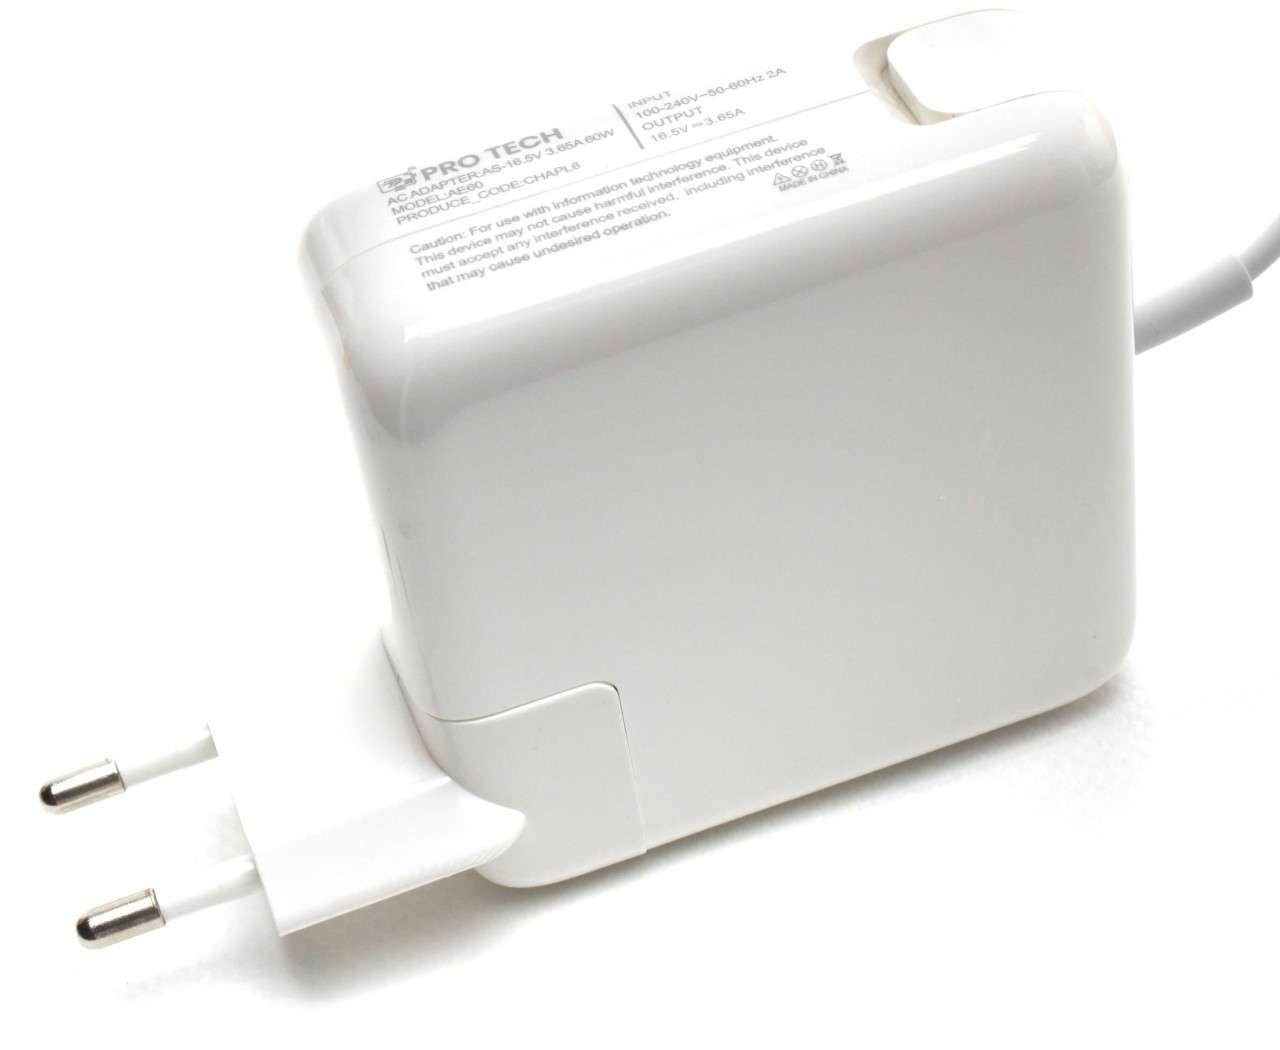 Incarcator Apple MacBook 13.3 inch Core Duo Replacement imagine